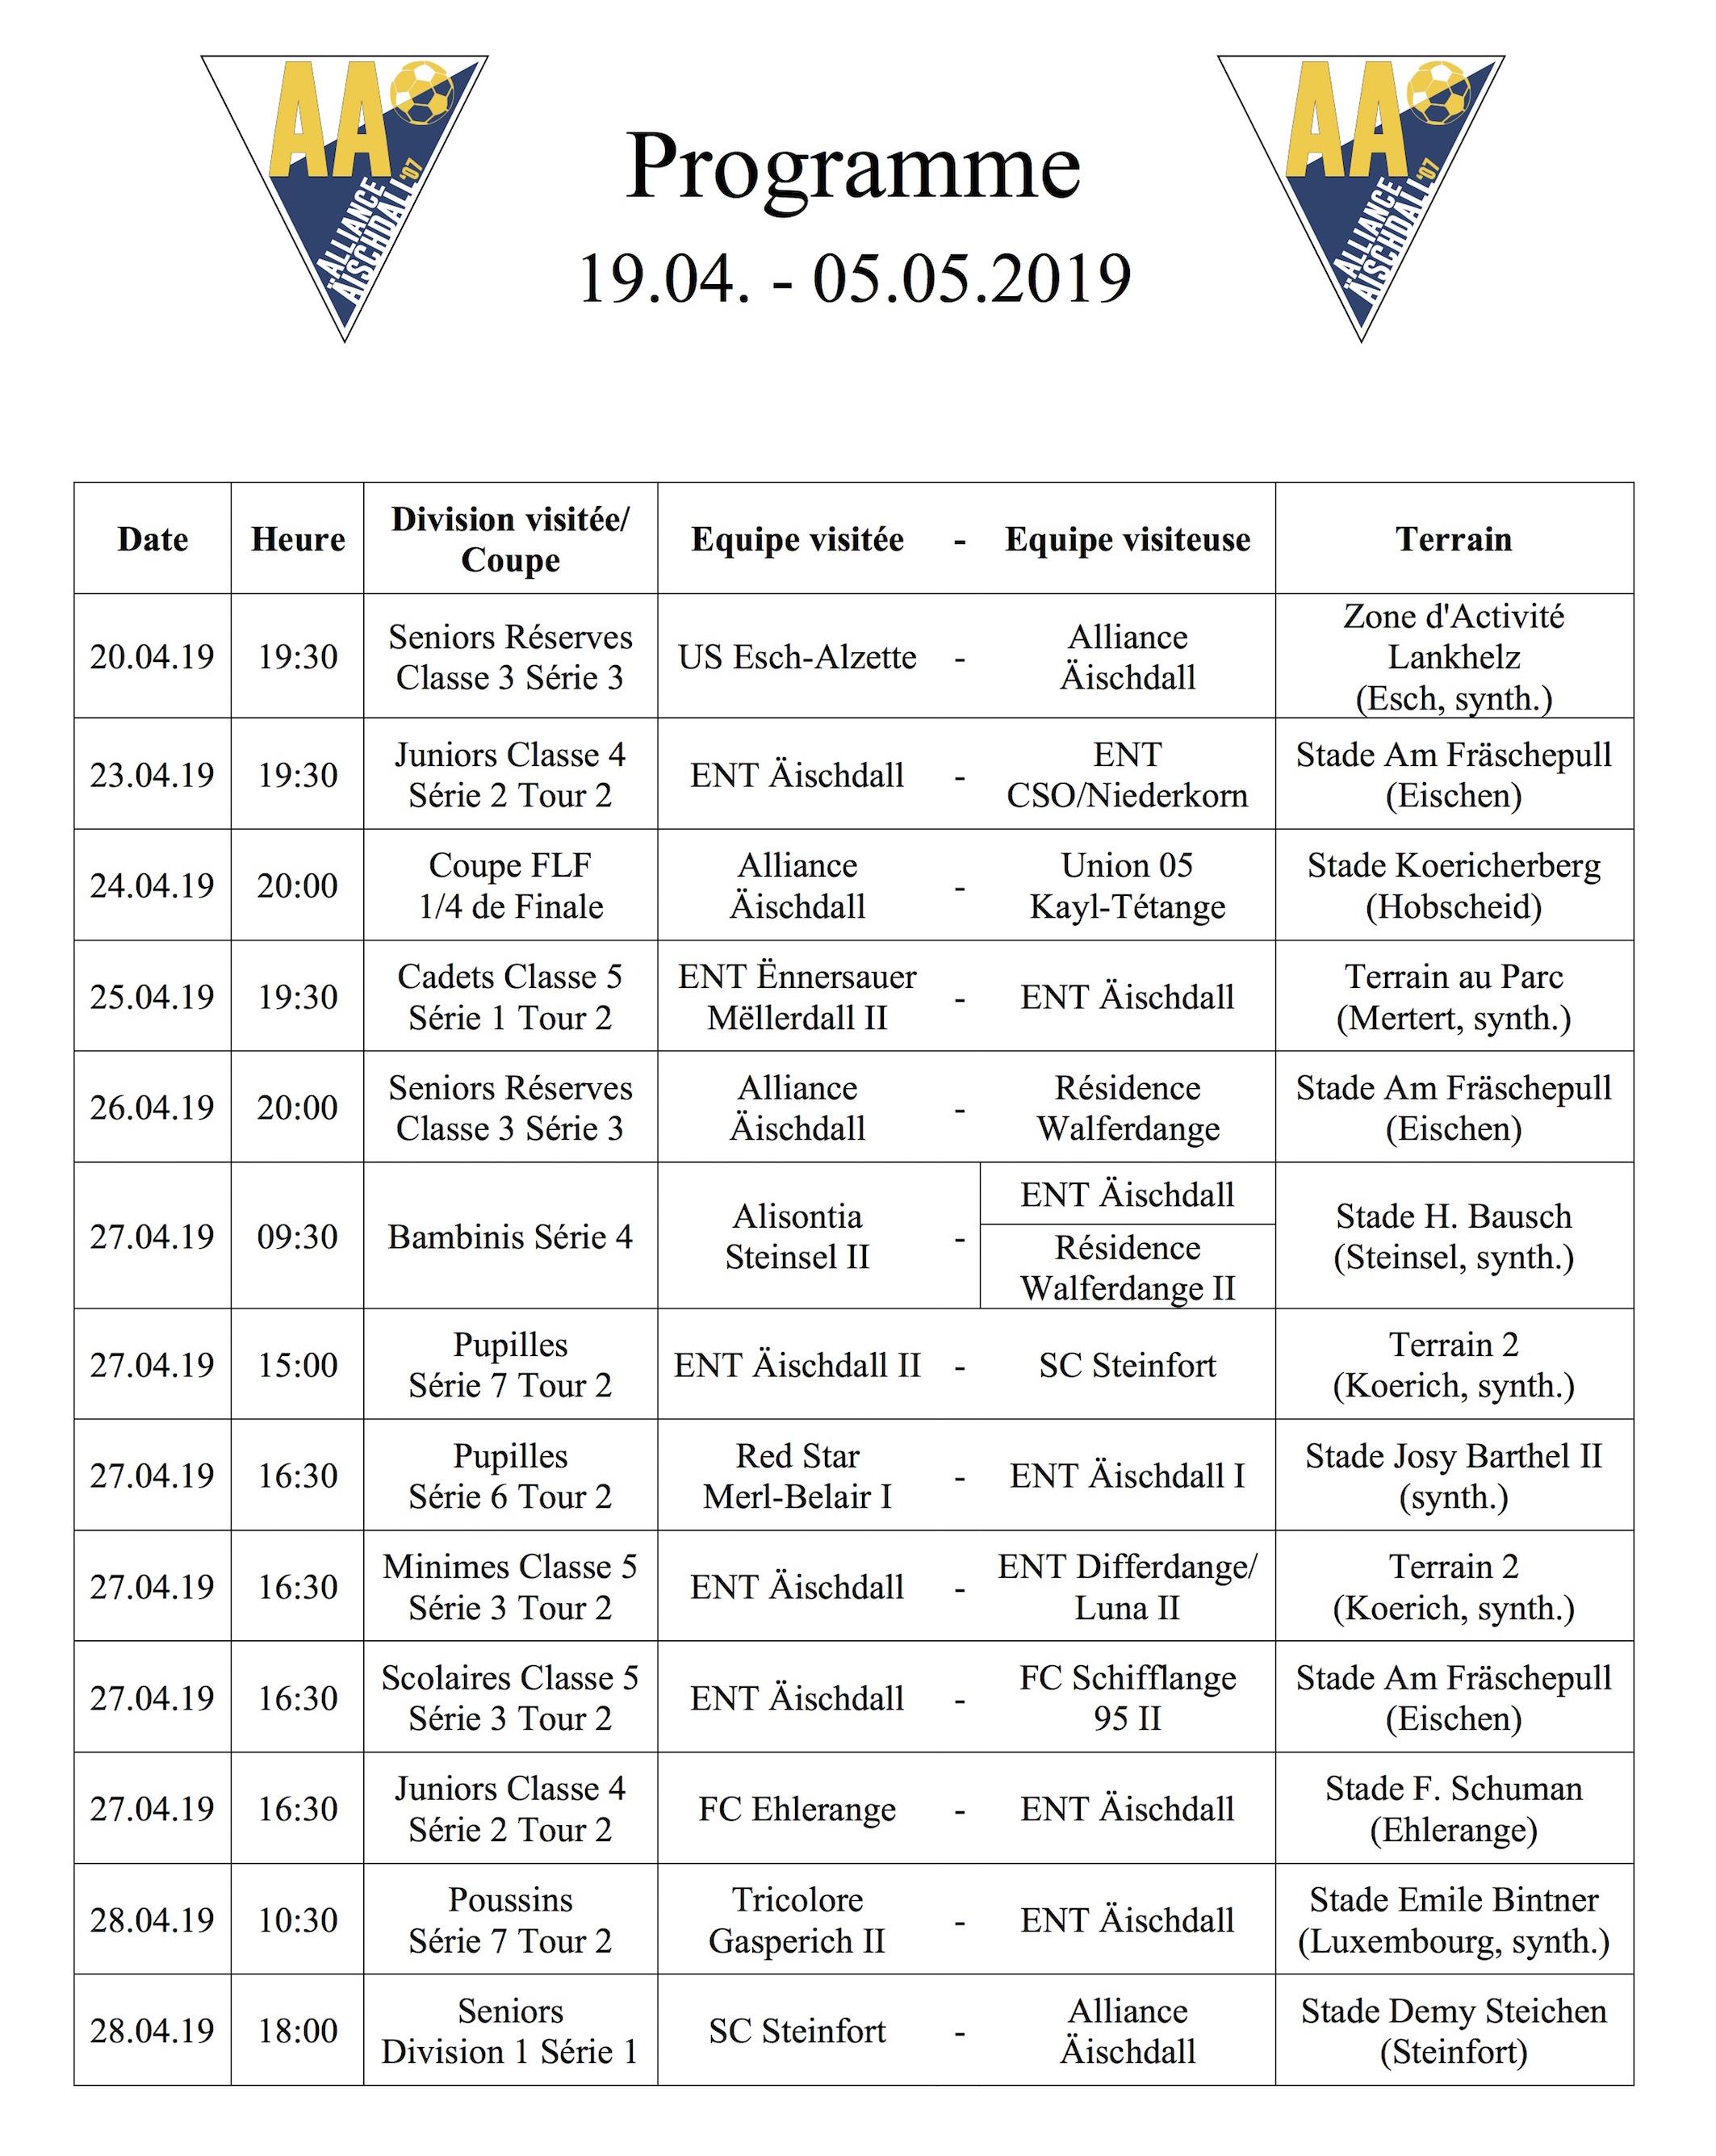 Programm 19.04.-05.05.2019